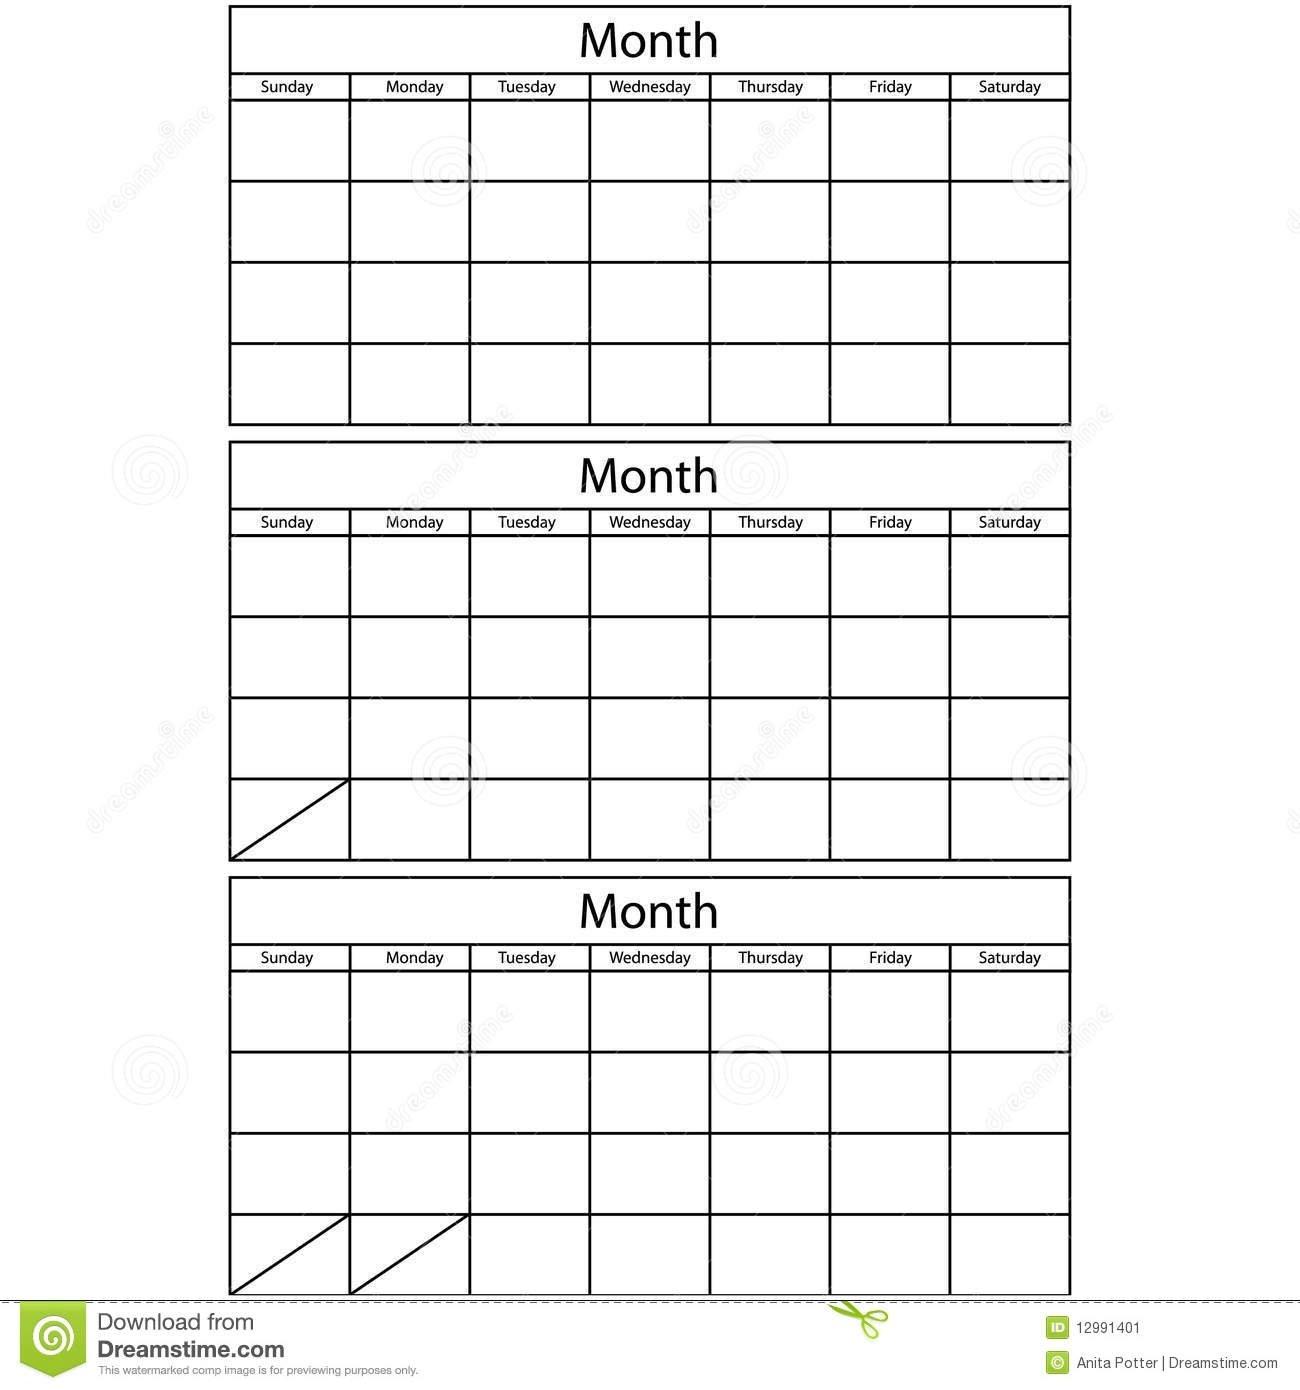 Printable Multi Month Calendars :-Free Calendar Template Printable 3 Month Calendar